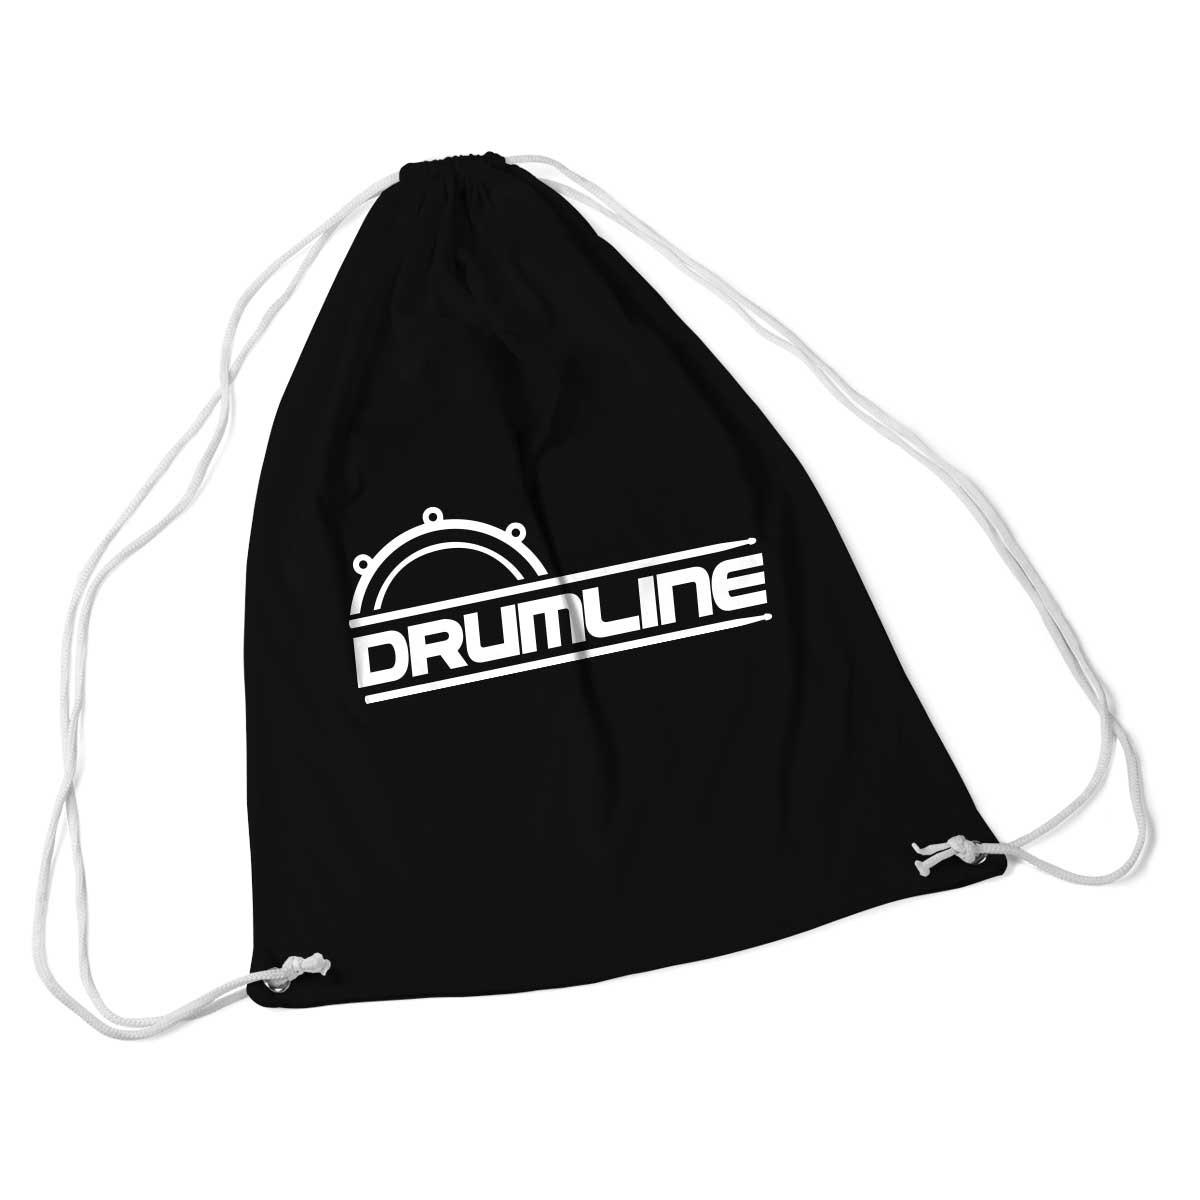 Drumline Drawstring